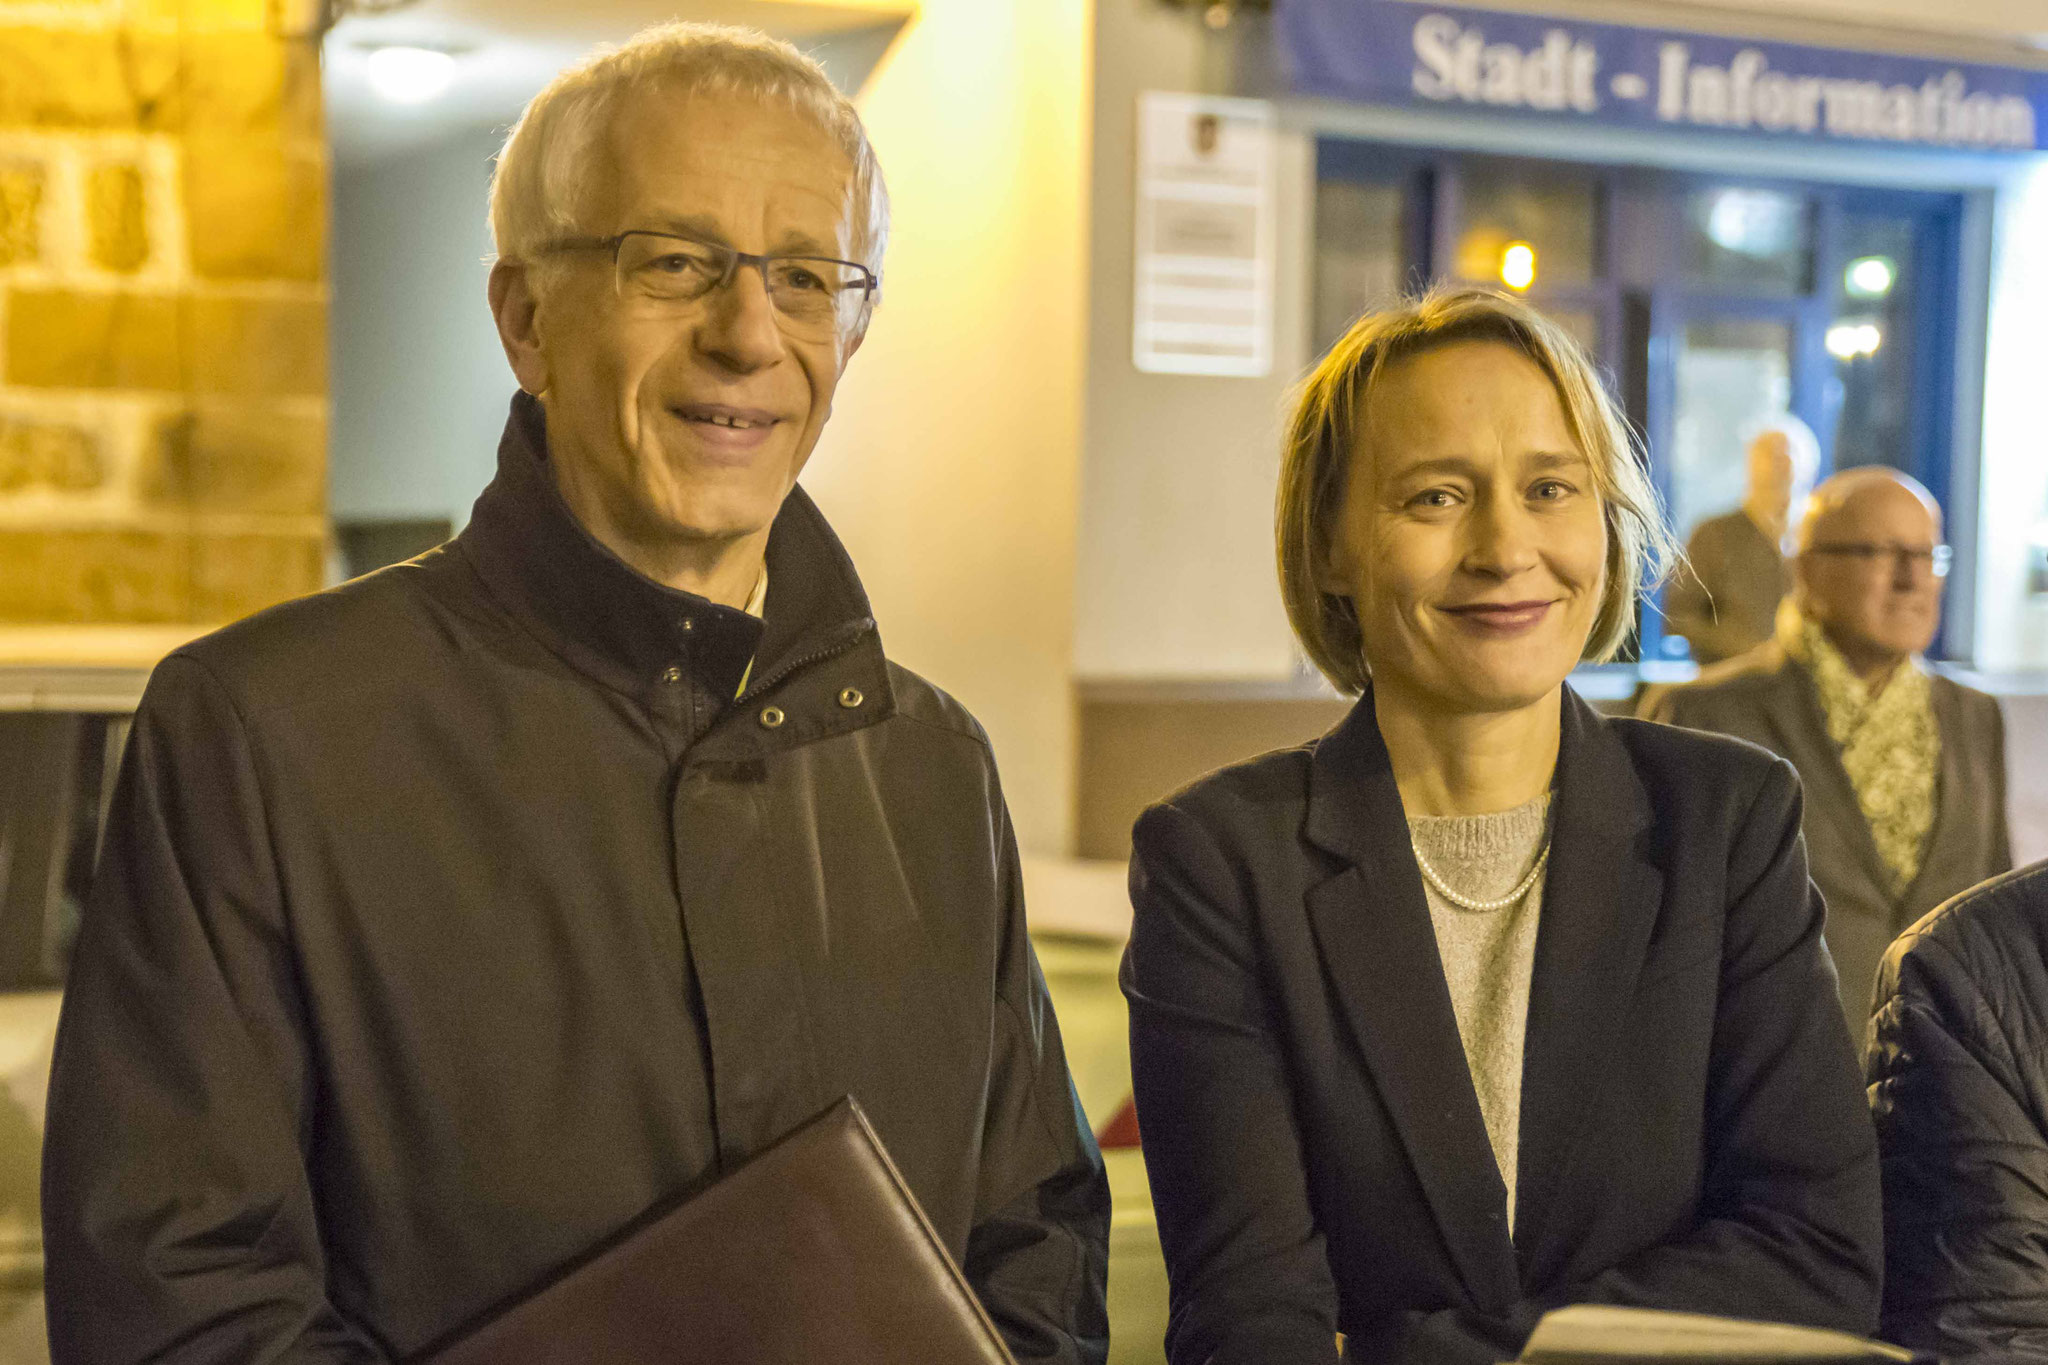 Propst Helmut Wöllenstein und Pfarrerin Katja Simon